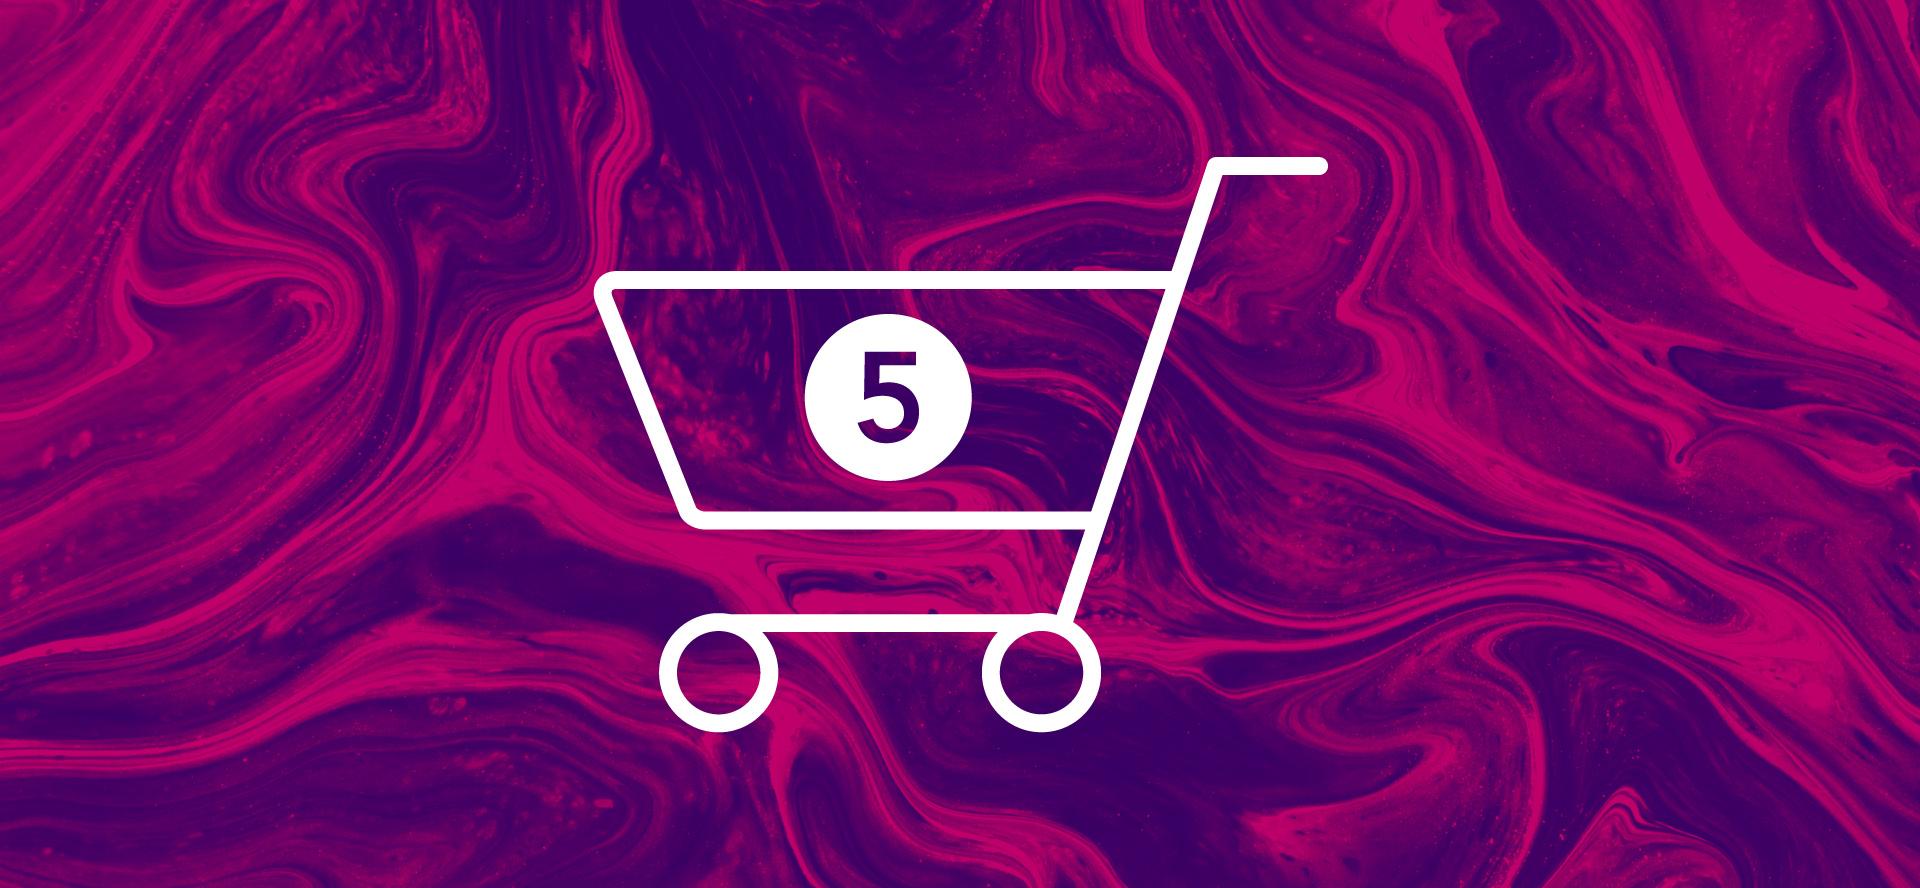 Abandoned online shopping cart